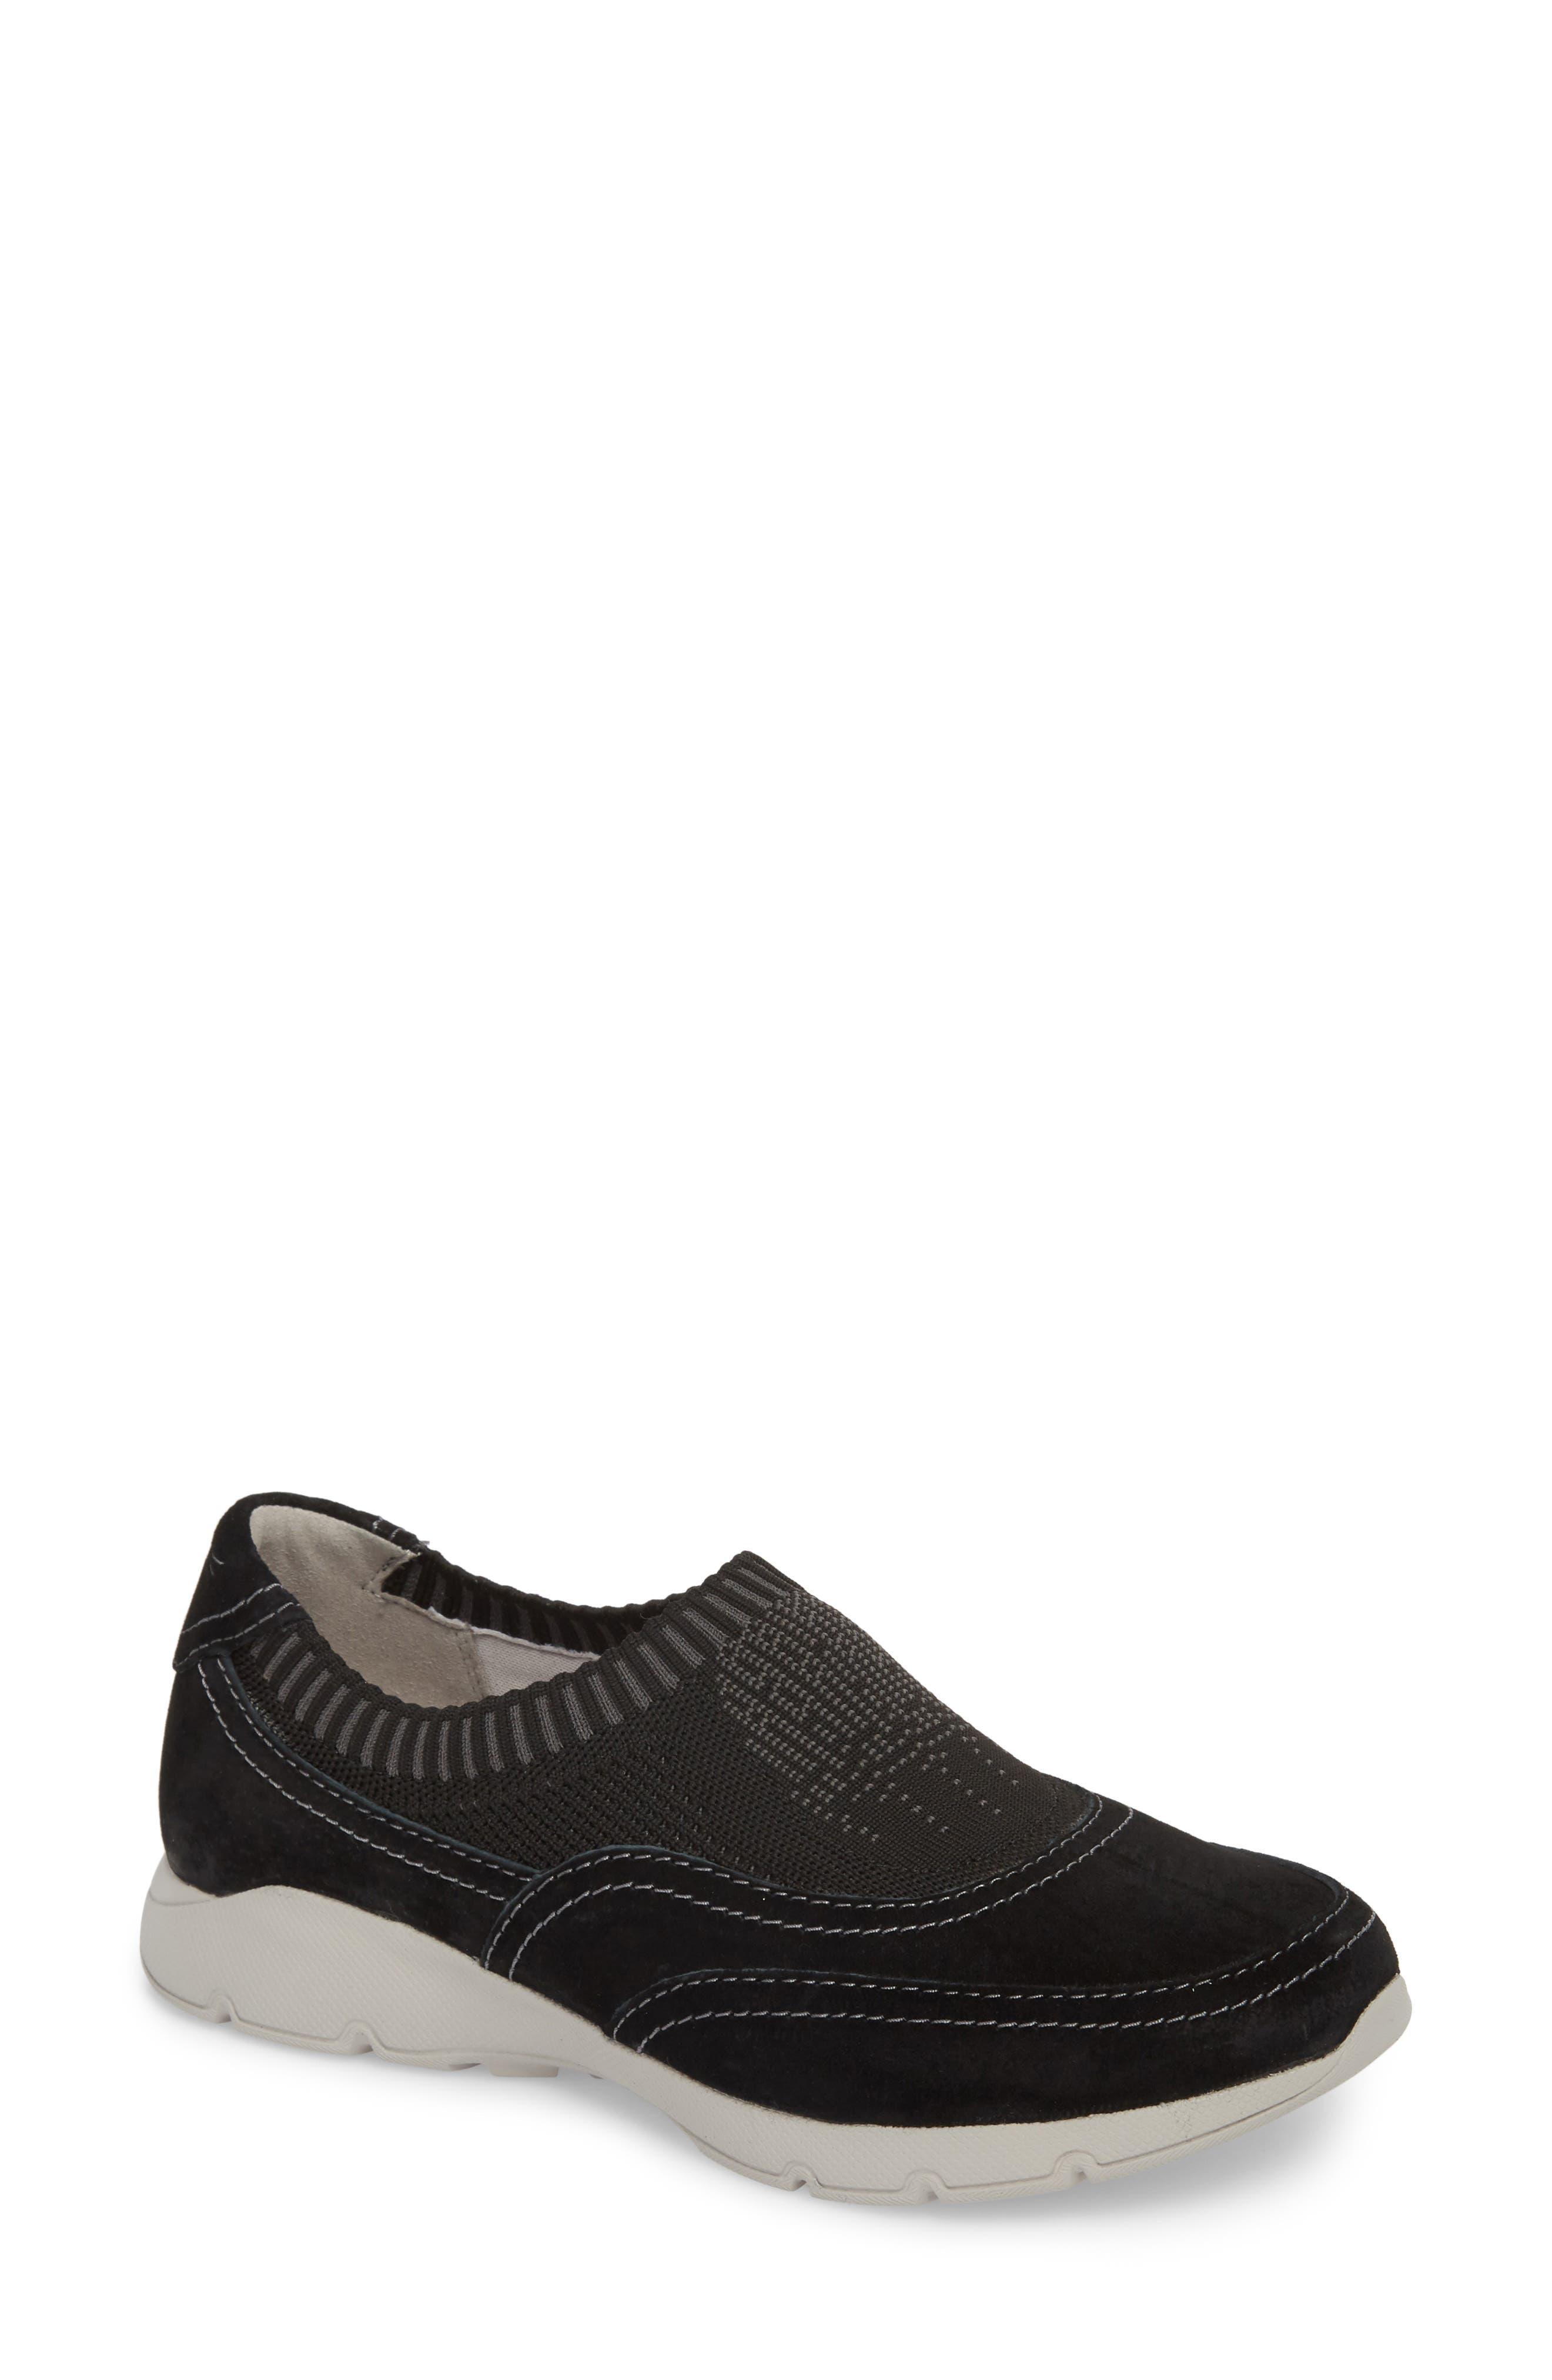 Alice Slip-On Sneaker,                             Main thumbnail 1, color,                             Black Suede